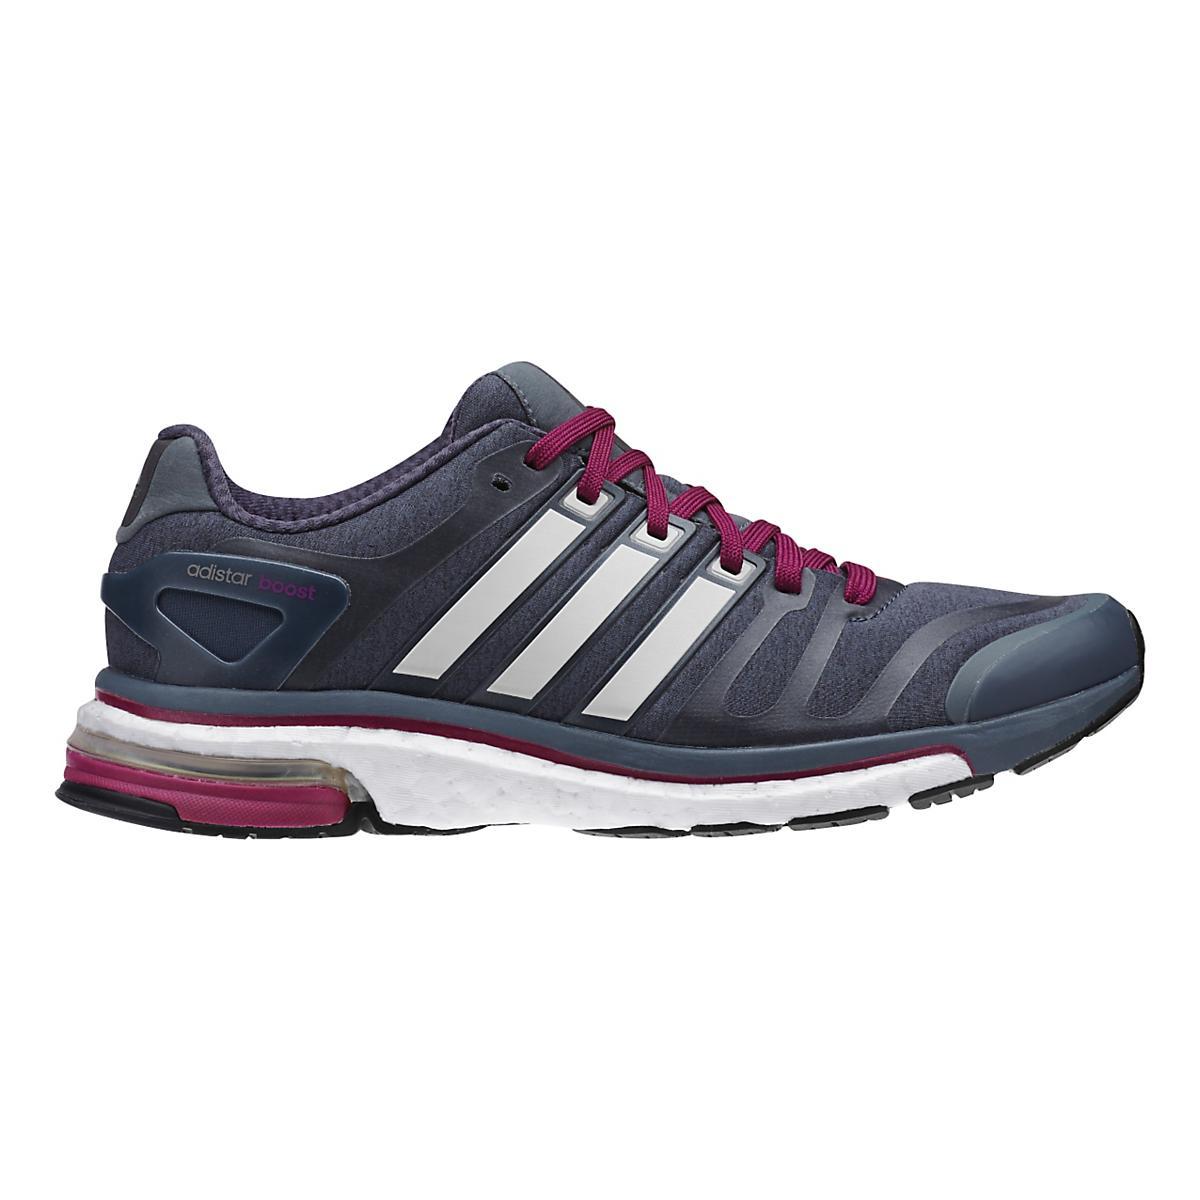 womens adidas adistar boost running shoe at road runner sports. Black Bedroom Furniture Sets. Home Design Ideas